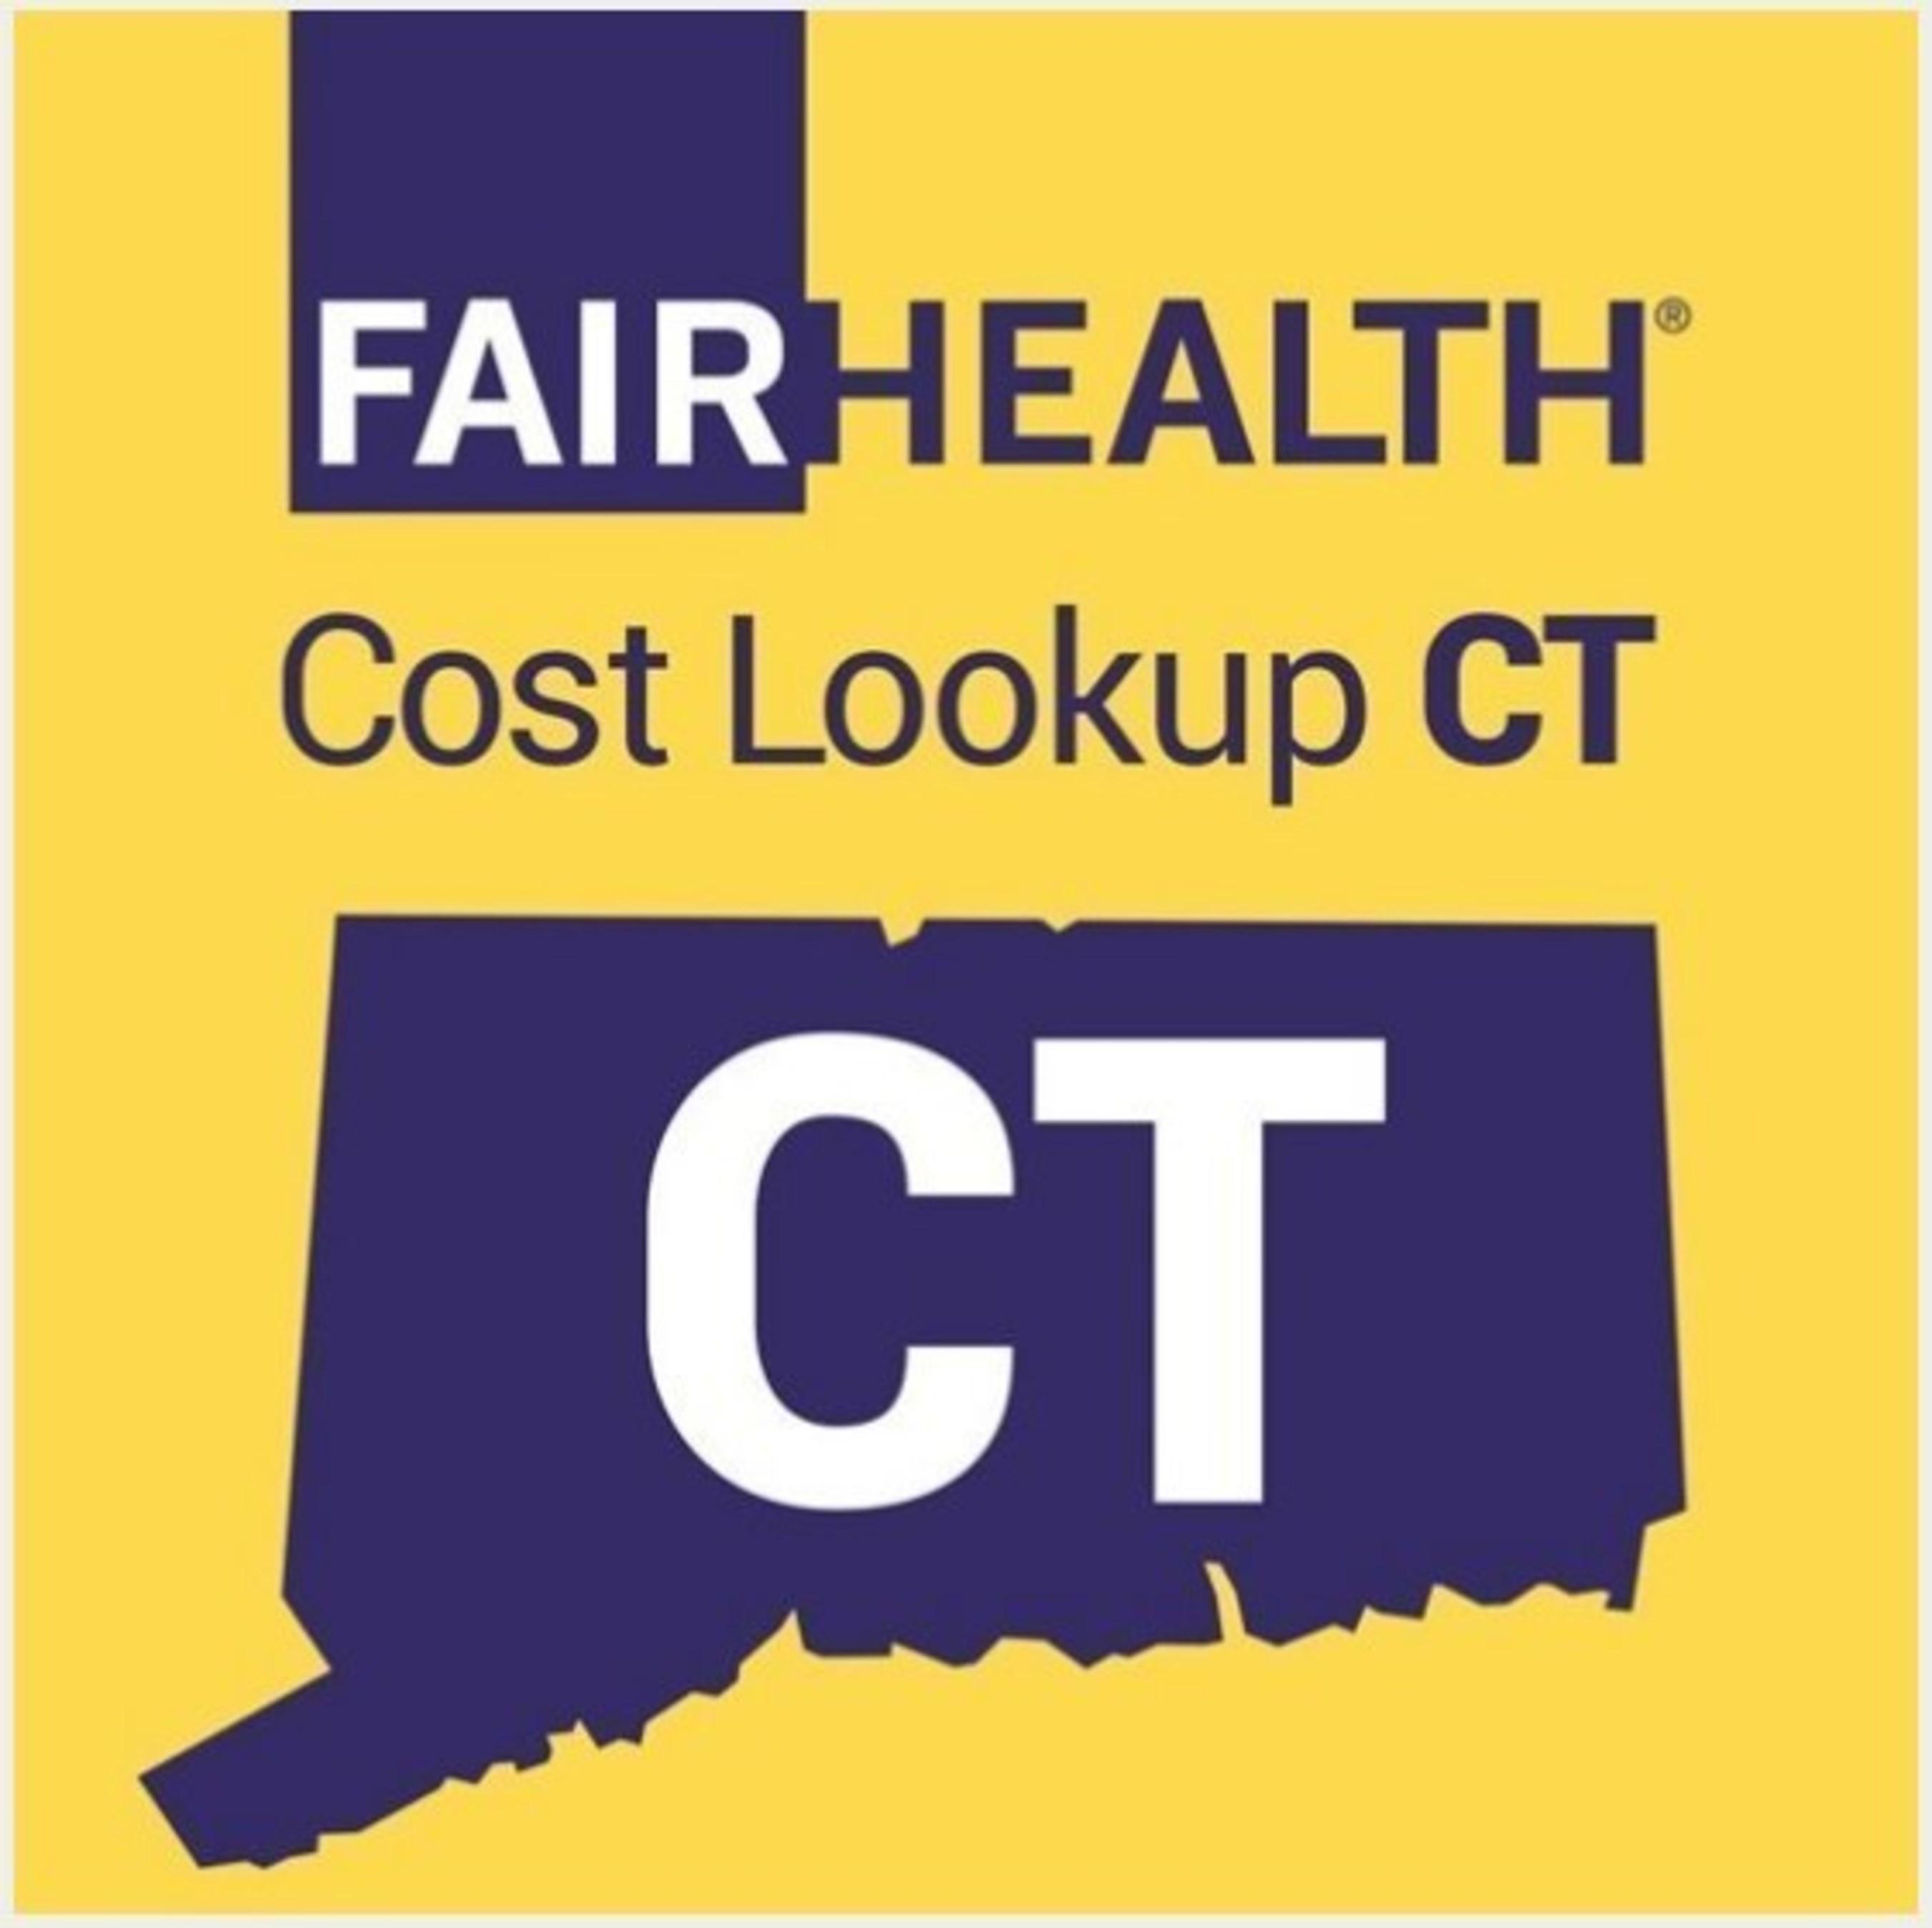 FAIR Health Launches Connecticut Consumer Healthcare Mobile App